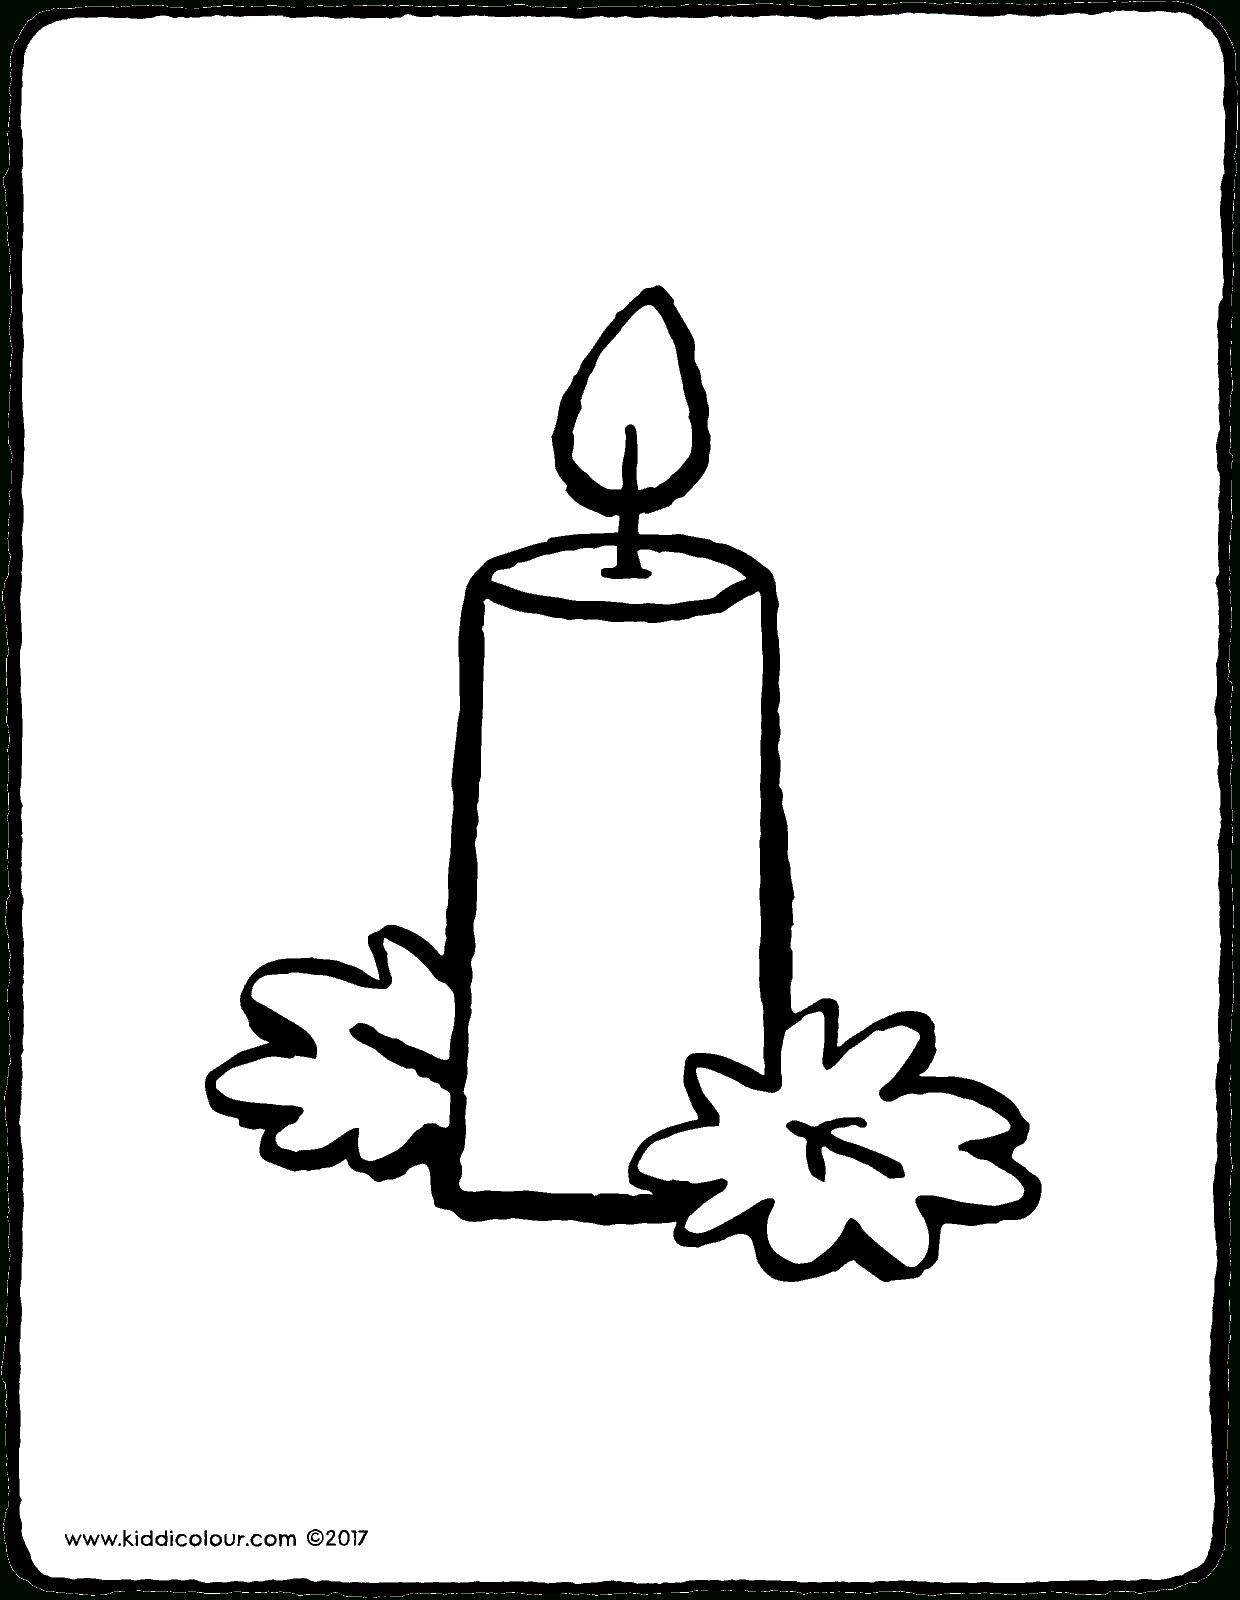 Kerze - Kiddimalseite innen Kerzen Ausmalbilder